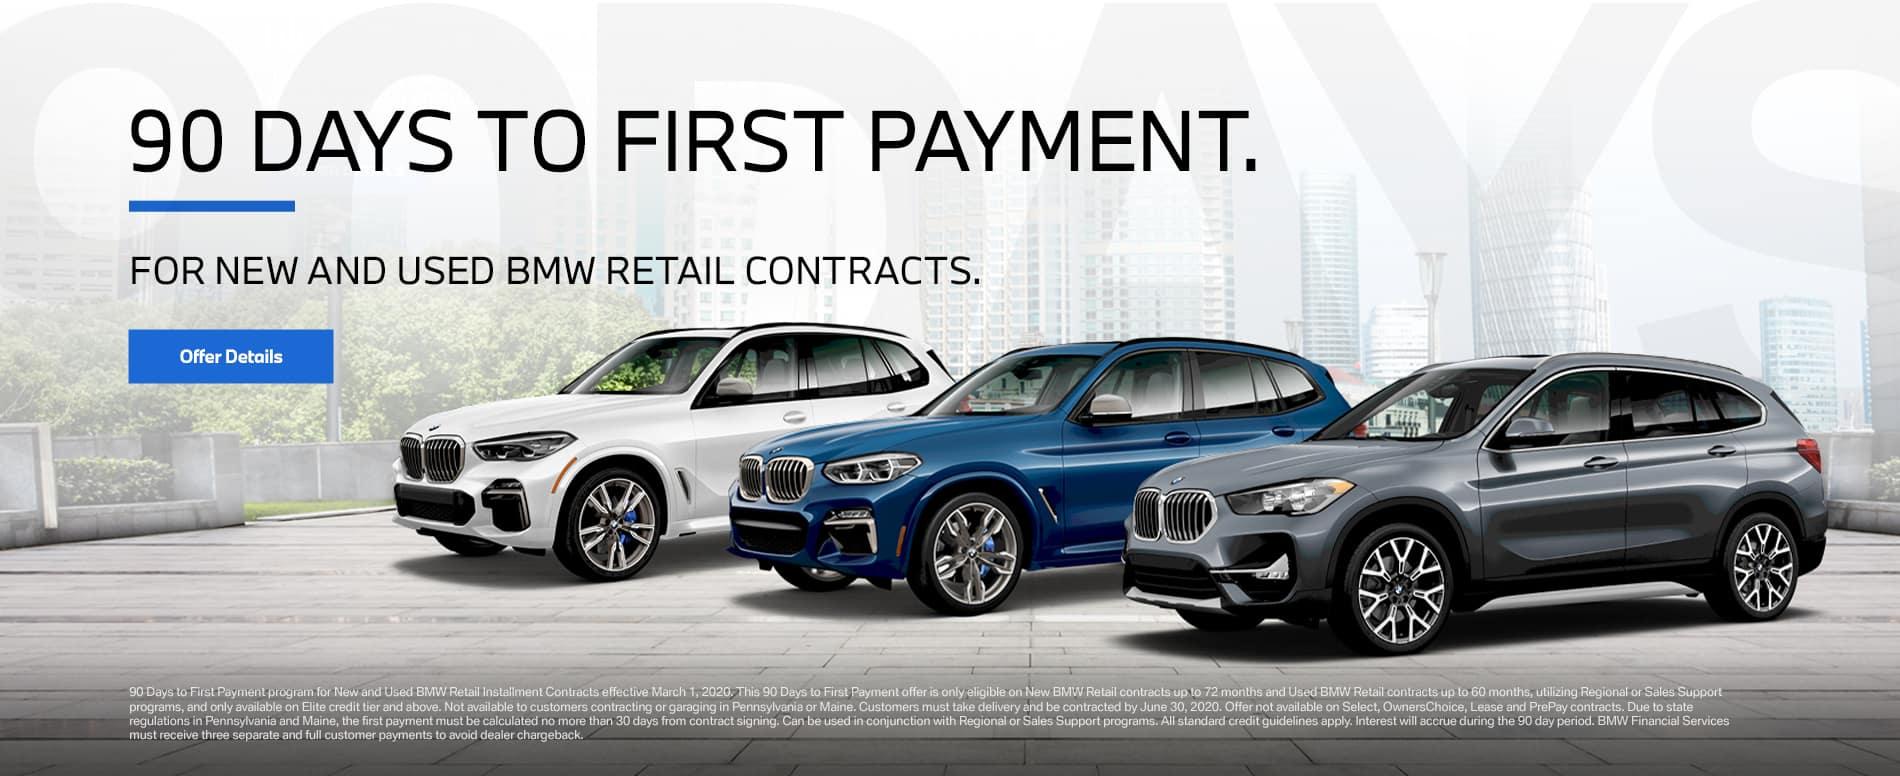 BMW 90 Days First Payment